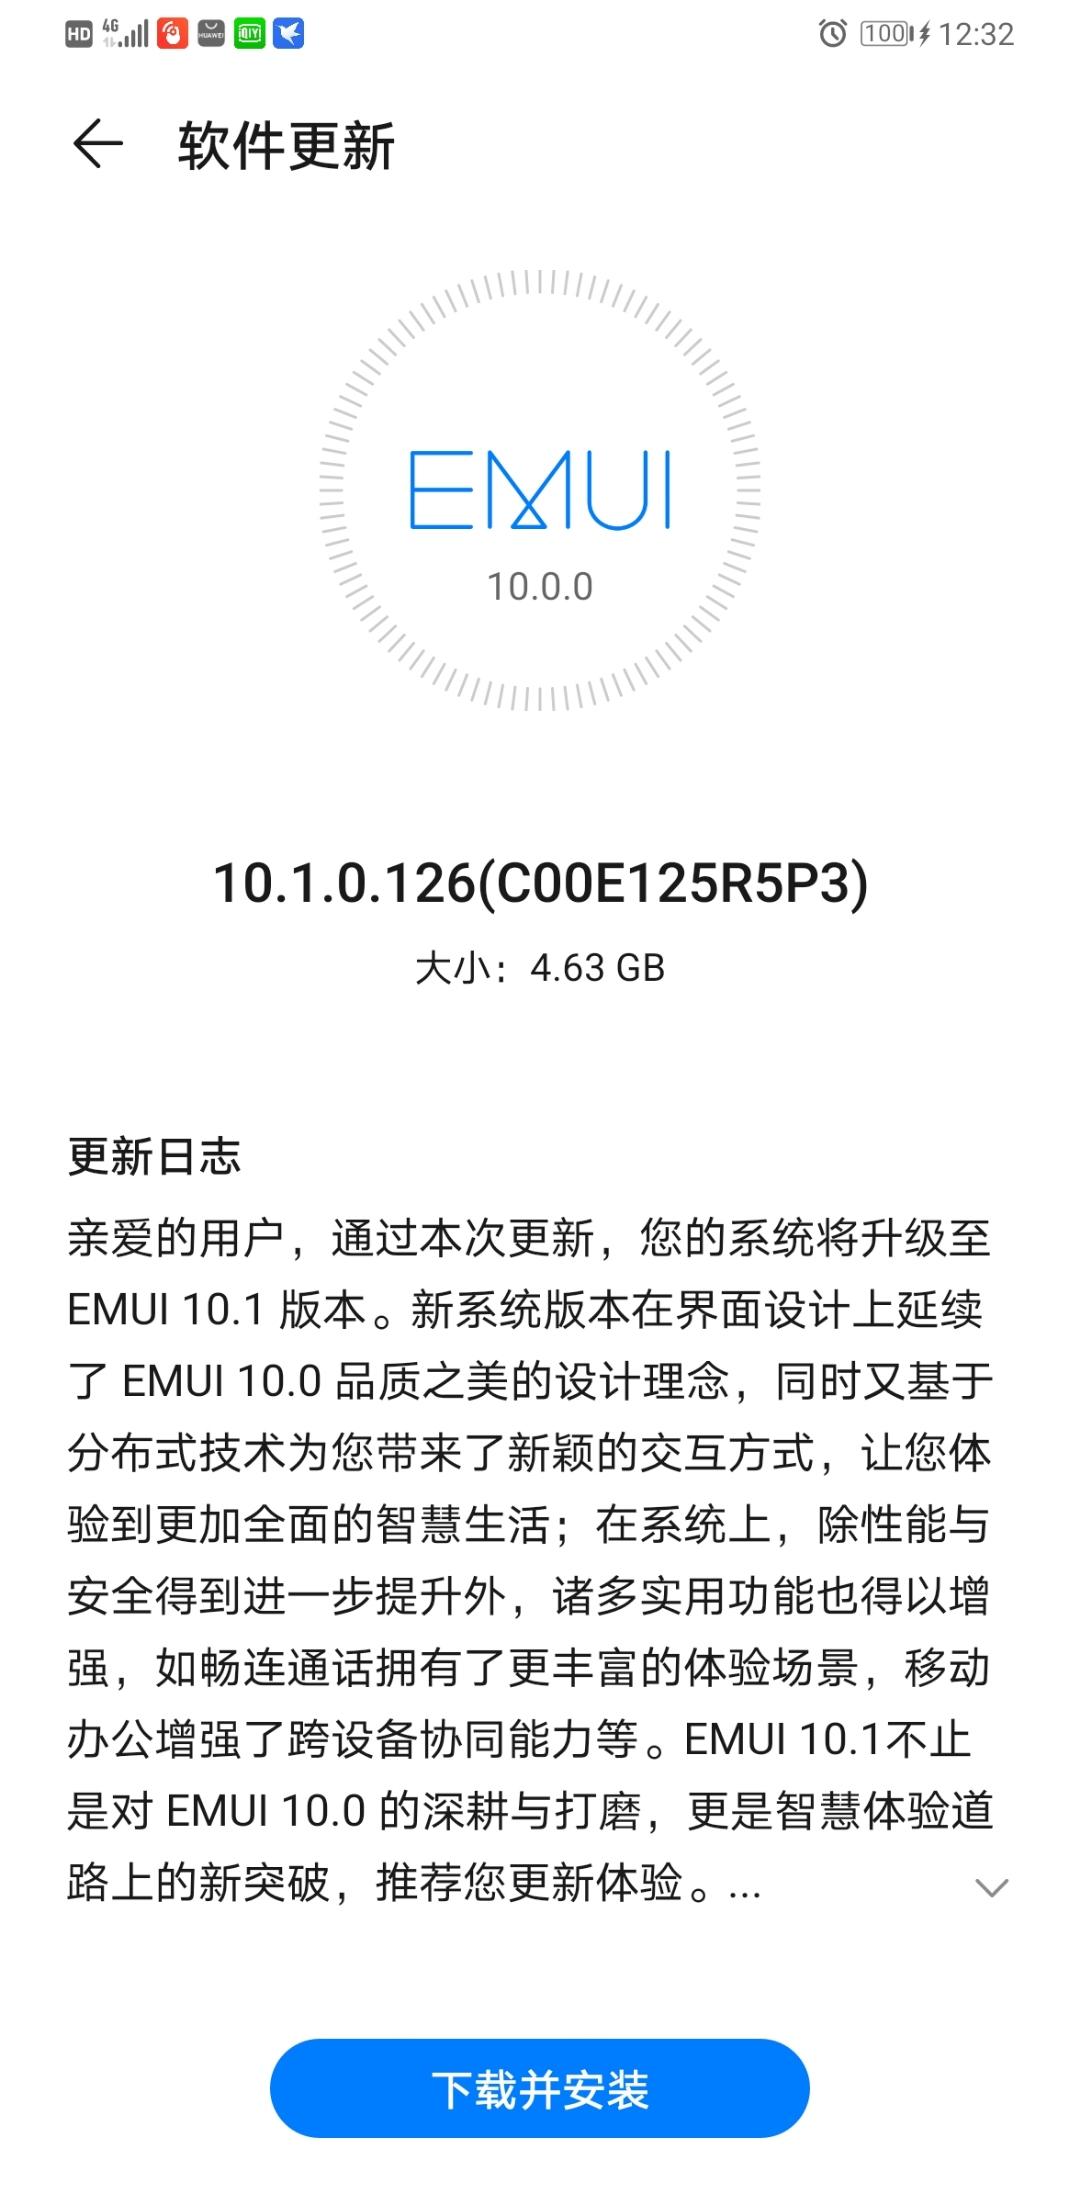 Screenshot_20200508_003253_com.huawei.android.hwouc.jpg